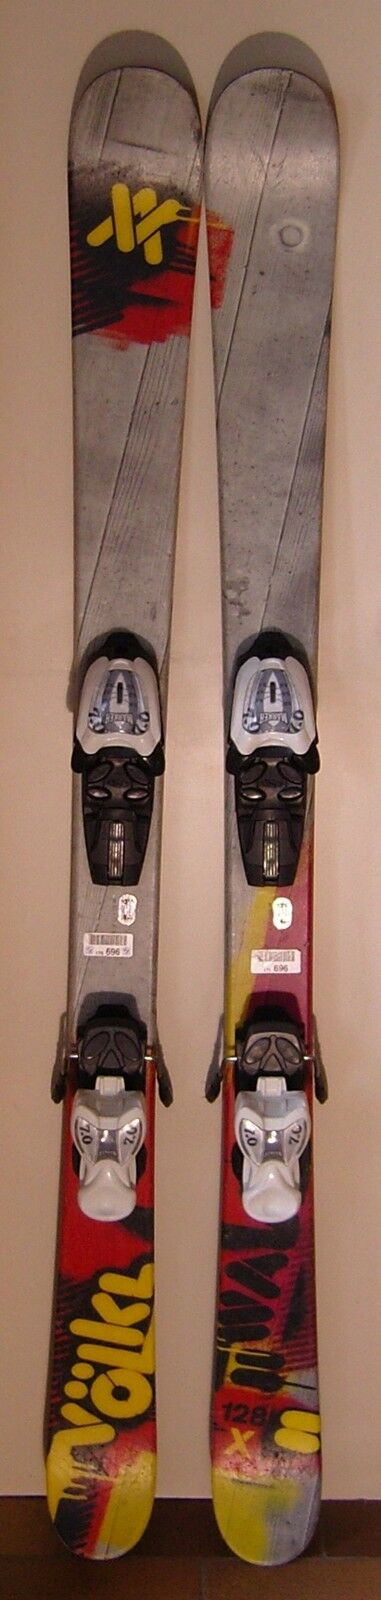 Ski Ski Ski gebraucht parabolisch Völkl Wall Junior - 128cm e9a62c